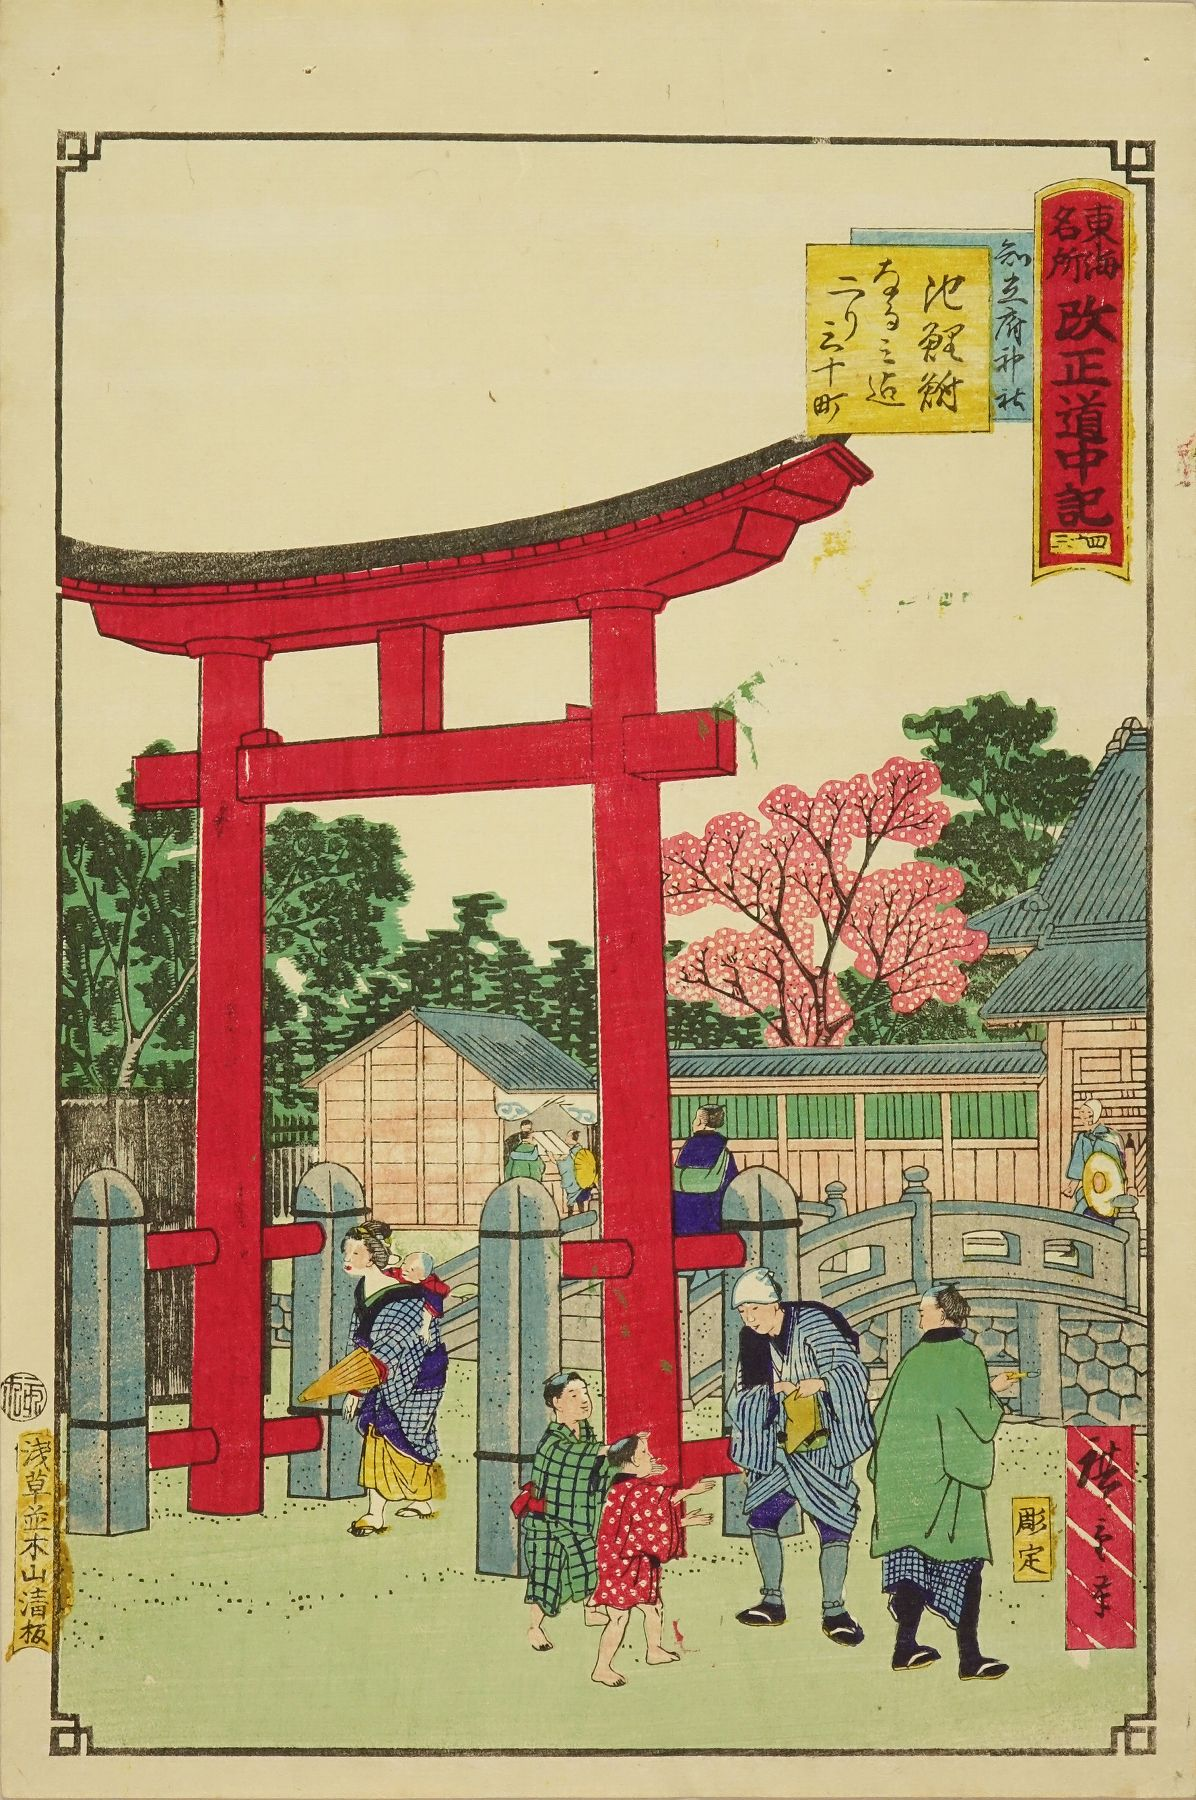 HIROSHIGE III Chiryu, the shrine, from <i>Tokai meisho kaisei dochukii</i> (Newly edited travel story of famous places of the Tokaido)